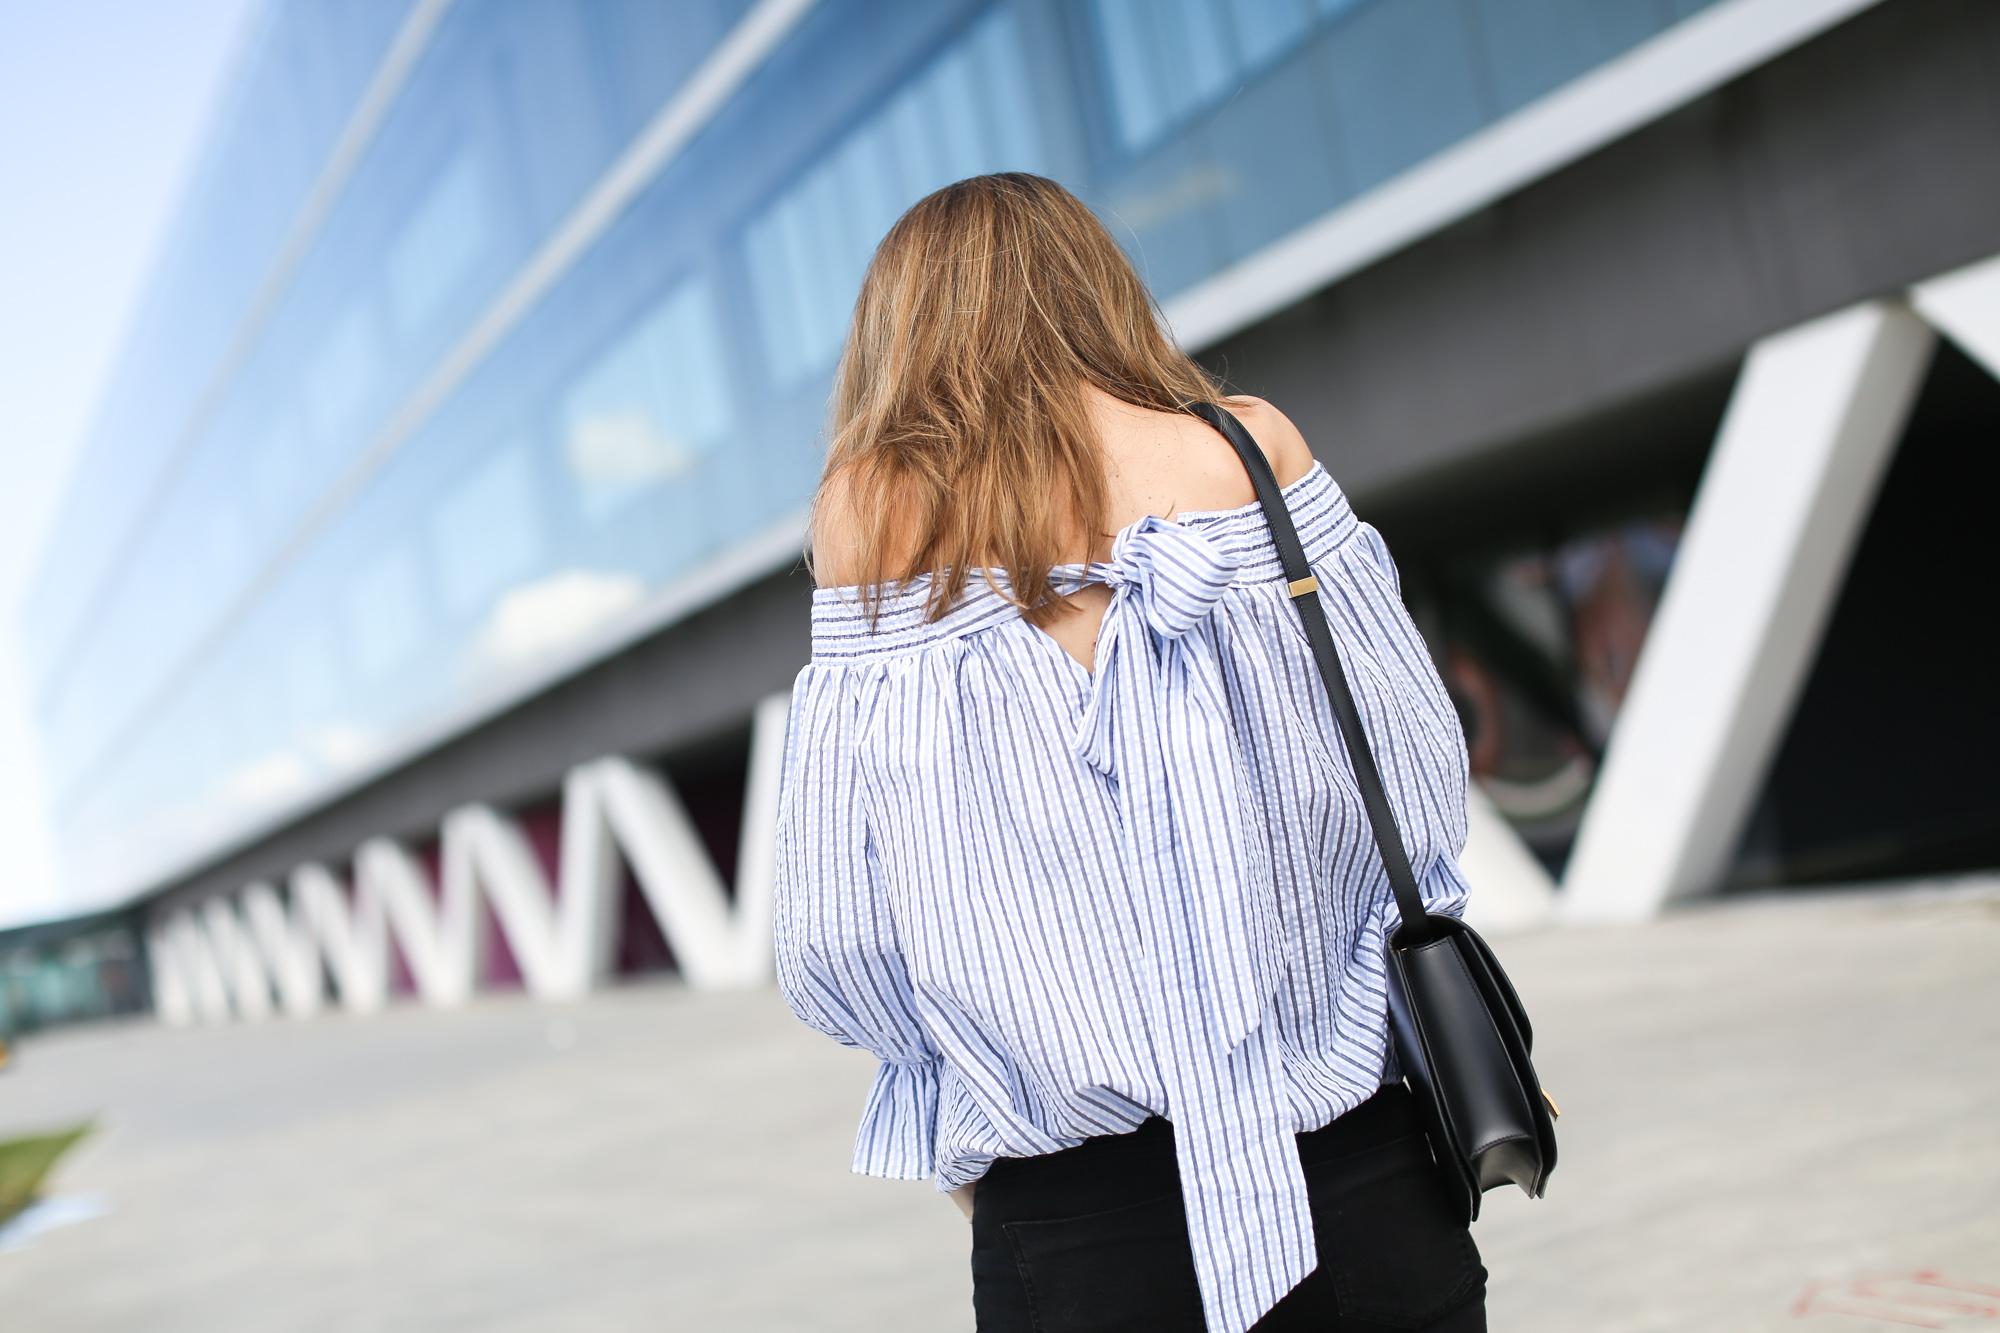 clochet_streetstyle_chicwish_blouse_mango_boho_jeans-9